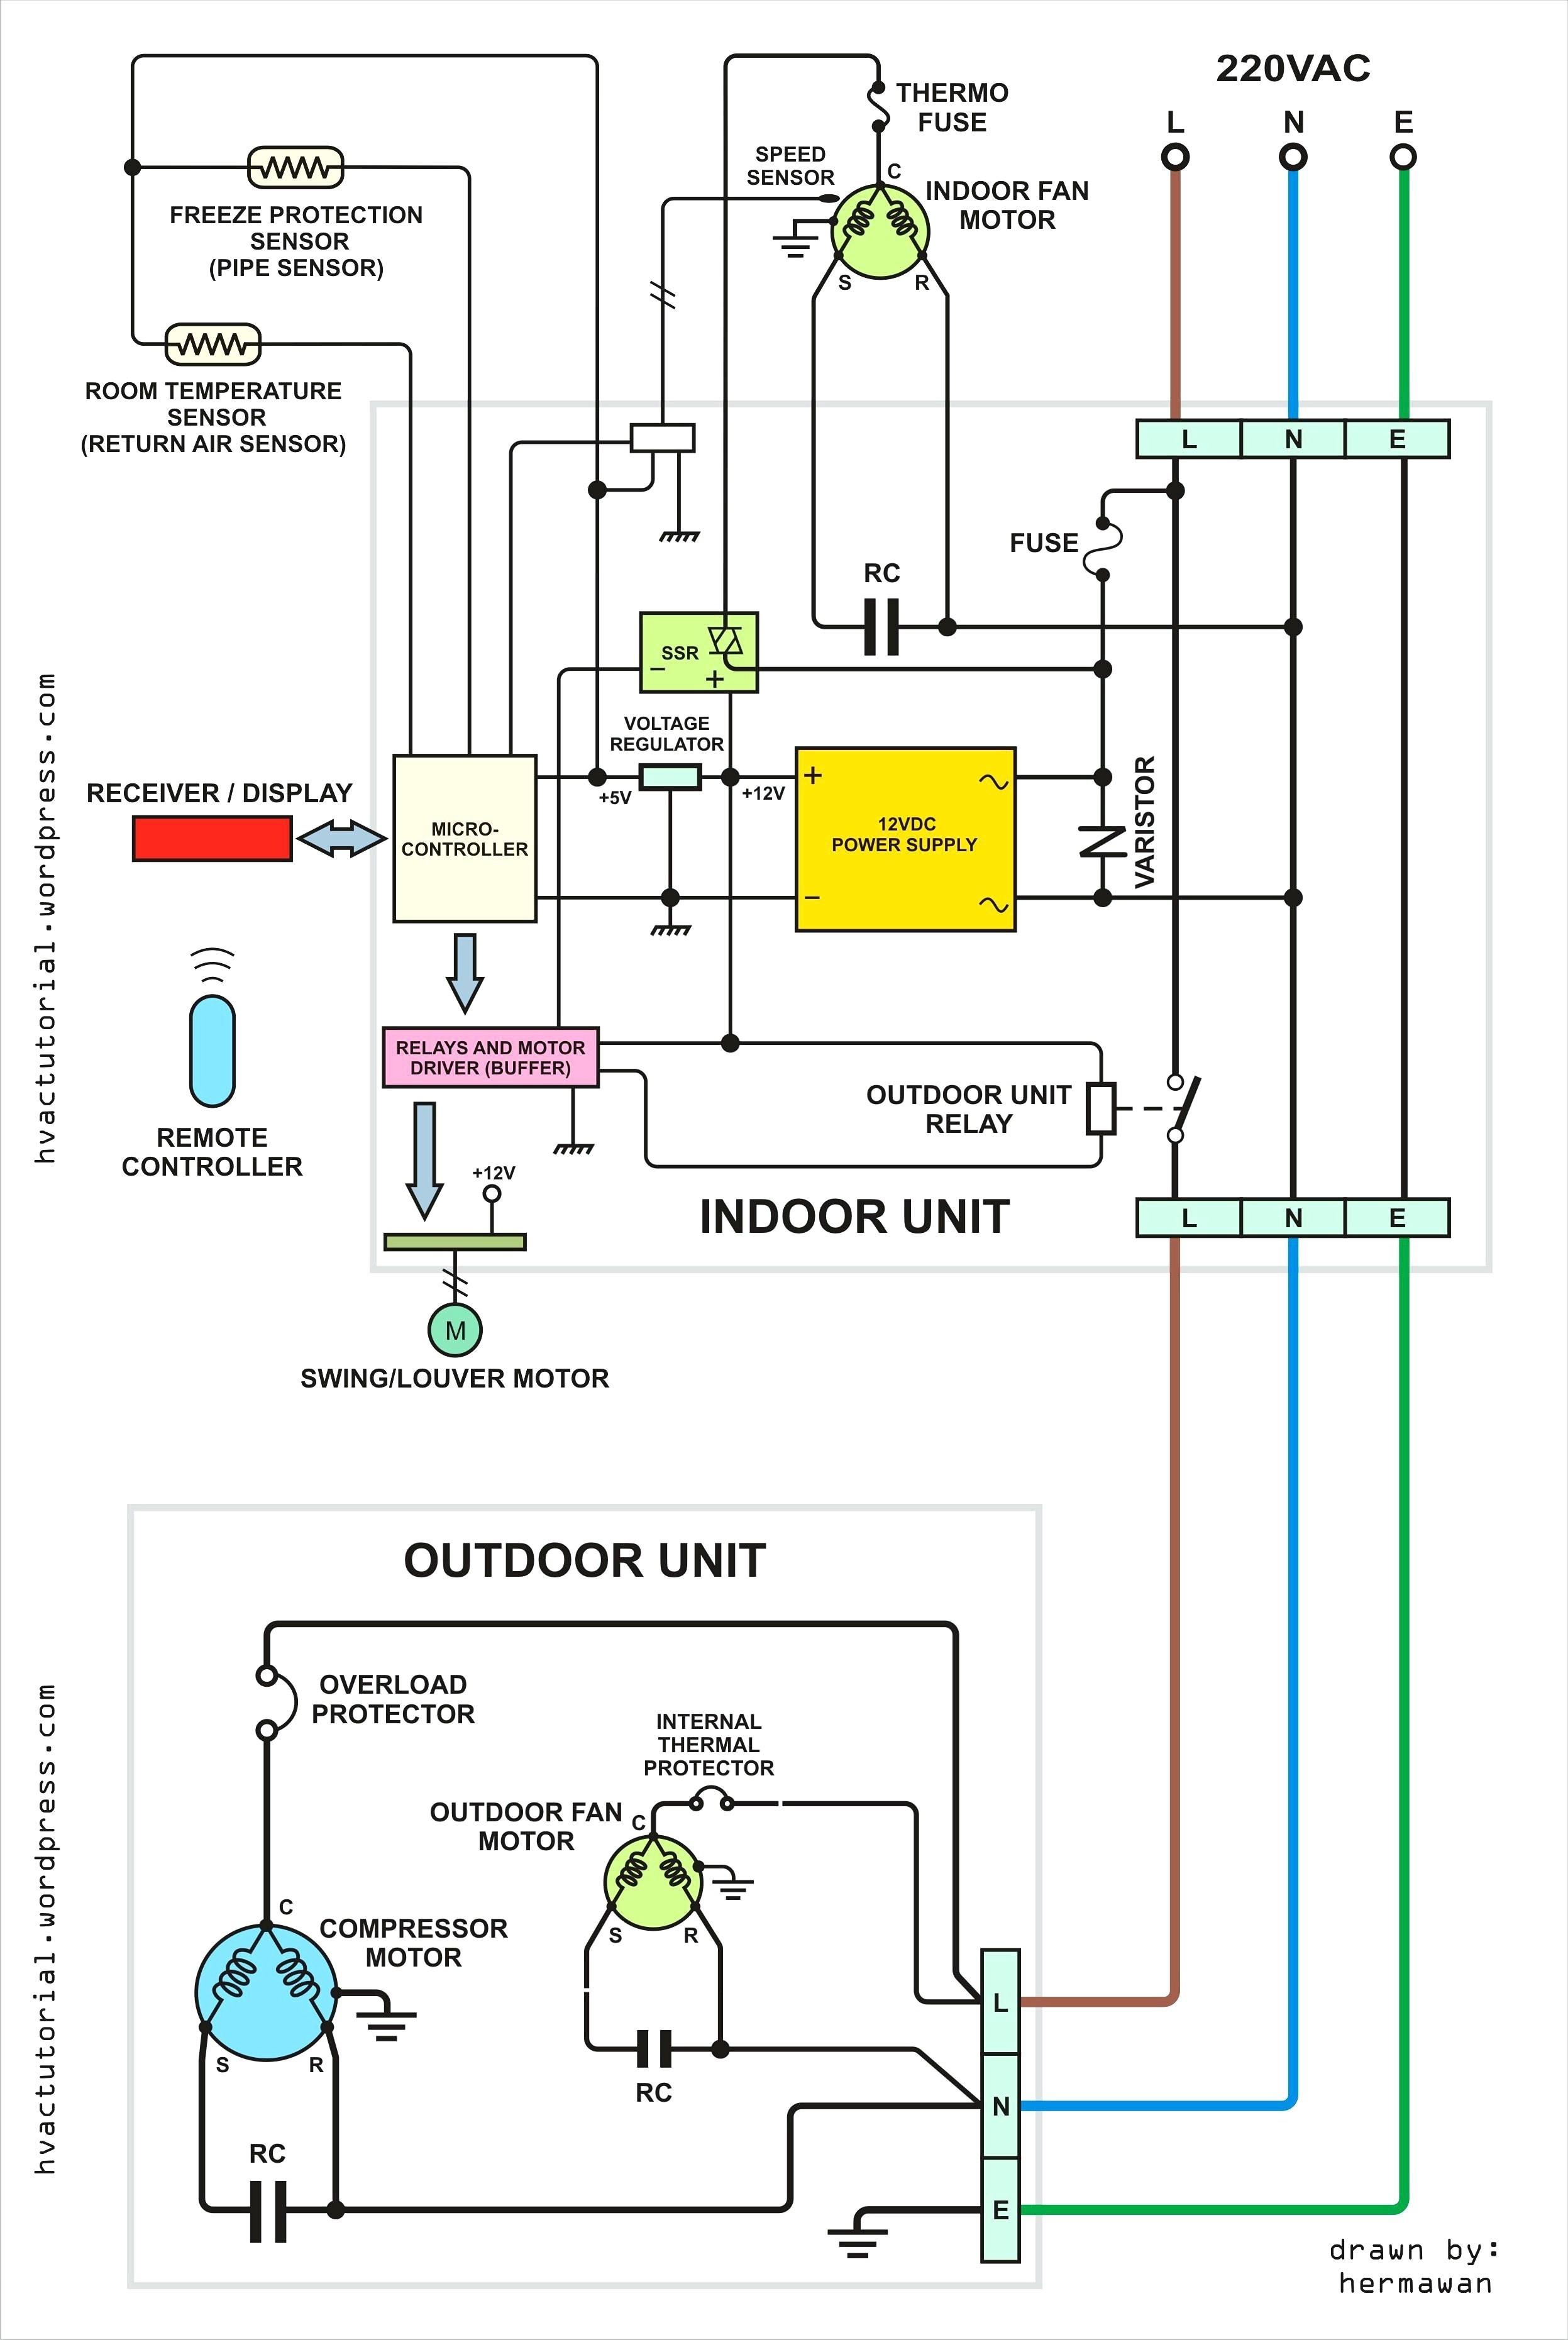 Honeywell Fan Limit Switch Wiring Diagram | My Wiring DIagram on